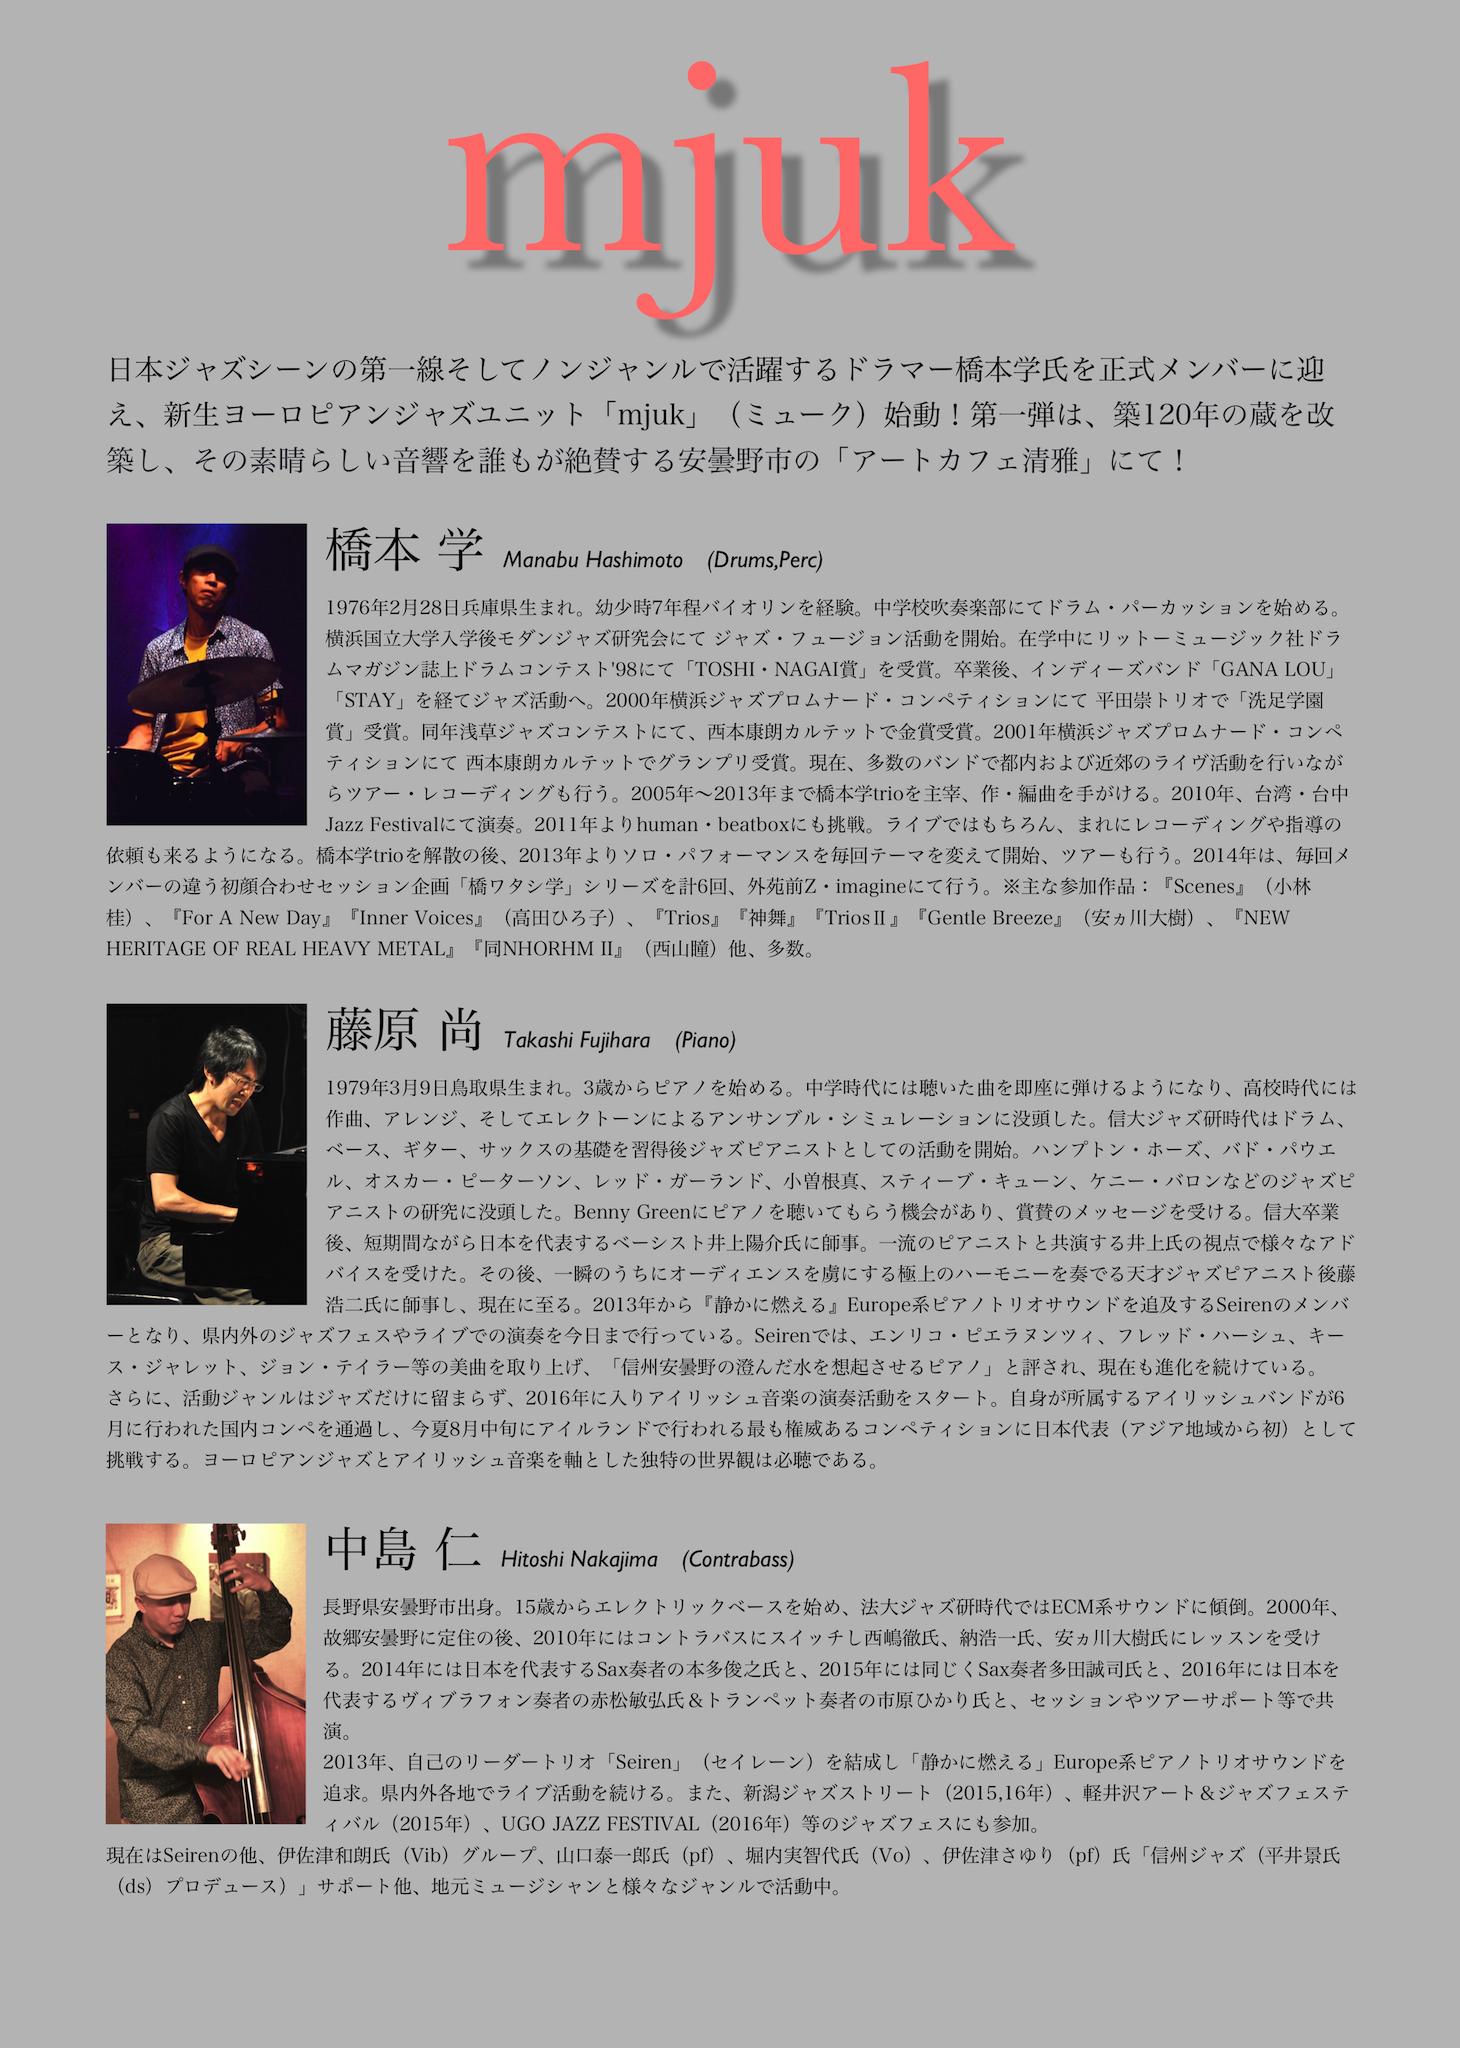 20170311_mjuk清雅_裏jpg